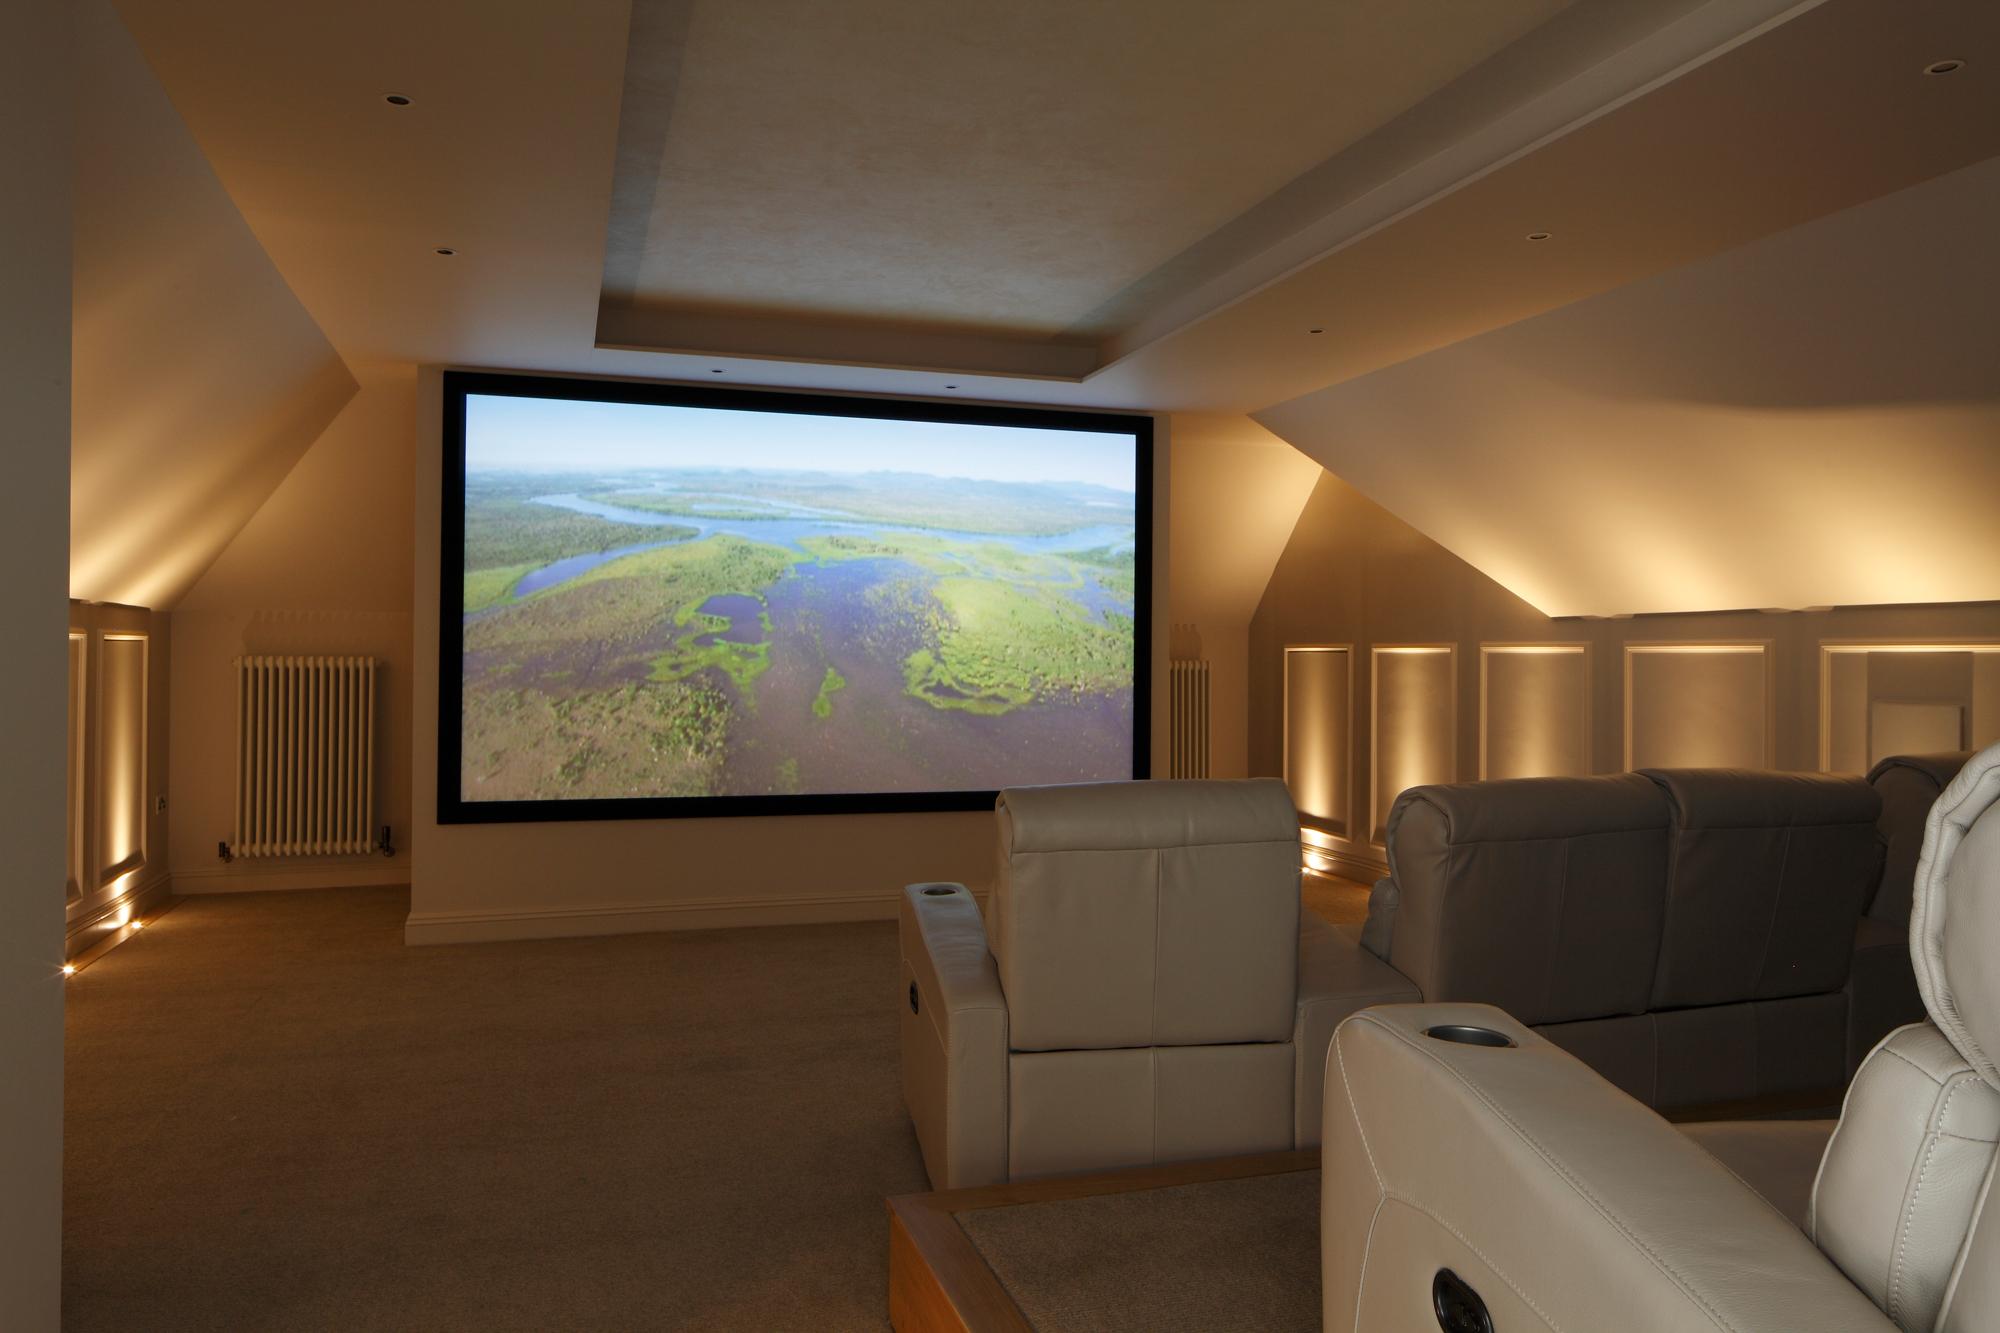 Loft Conversion Home Cinema Surrey New Wave Av